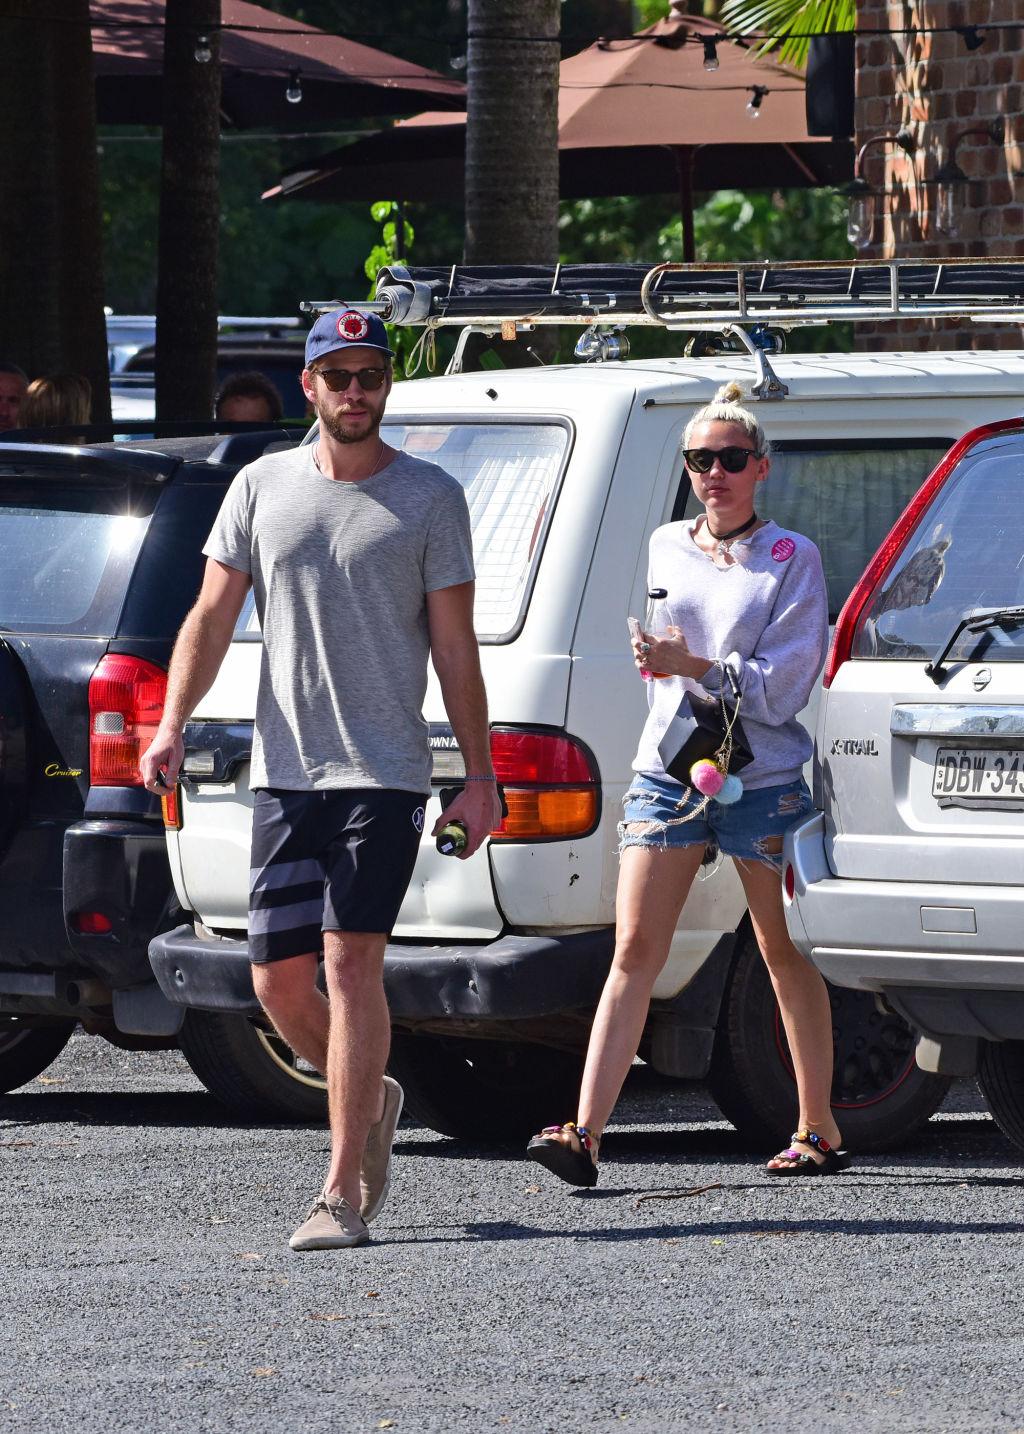 Liam Hemsworth and Miley Cyrus in Byron Bay last weekend. Pic credit: Getty